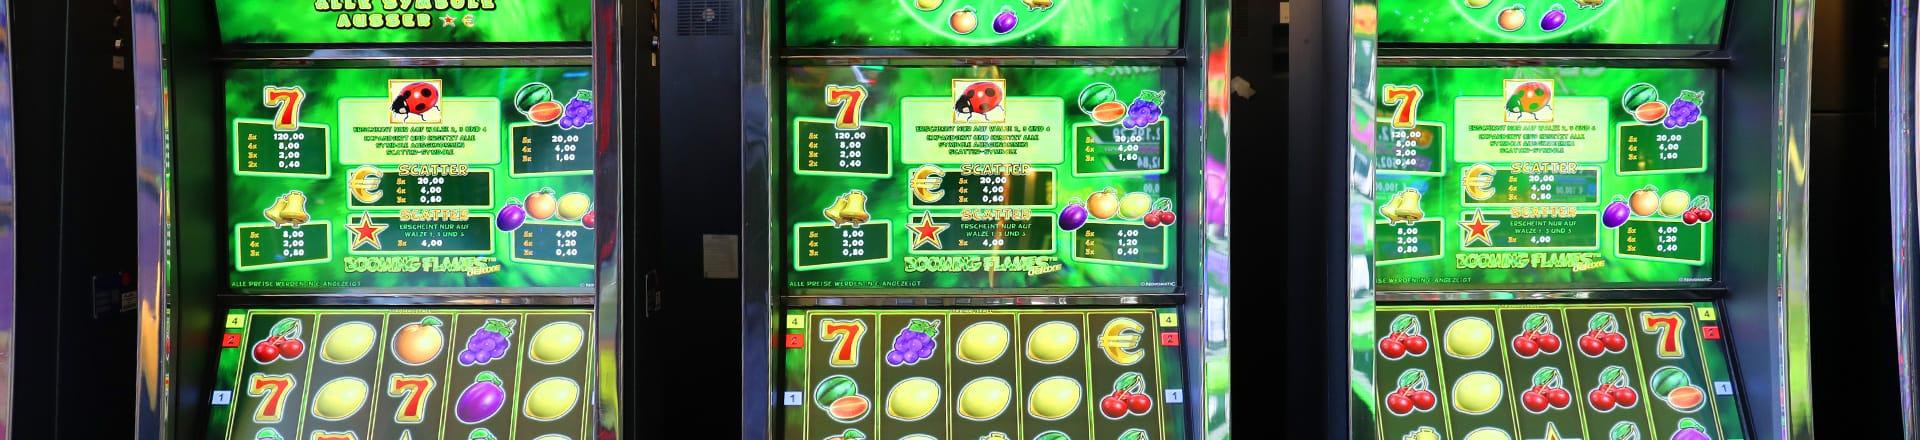 Spiele Timer Roulette Privee - Video Slots Online